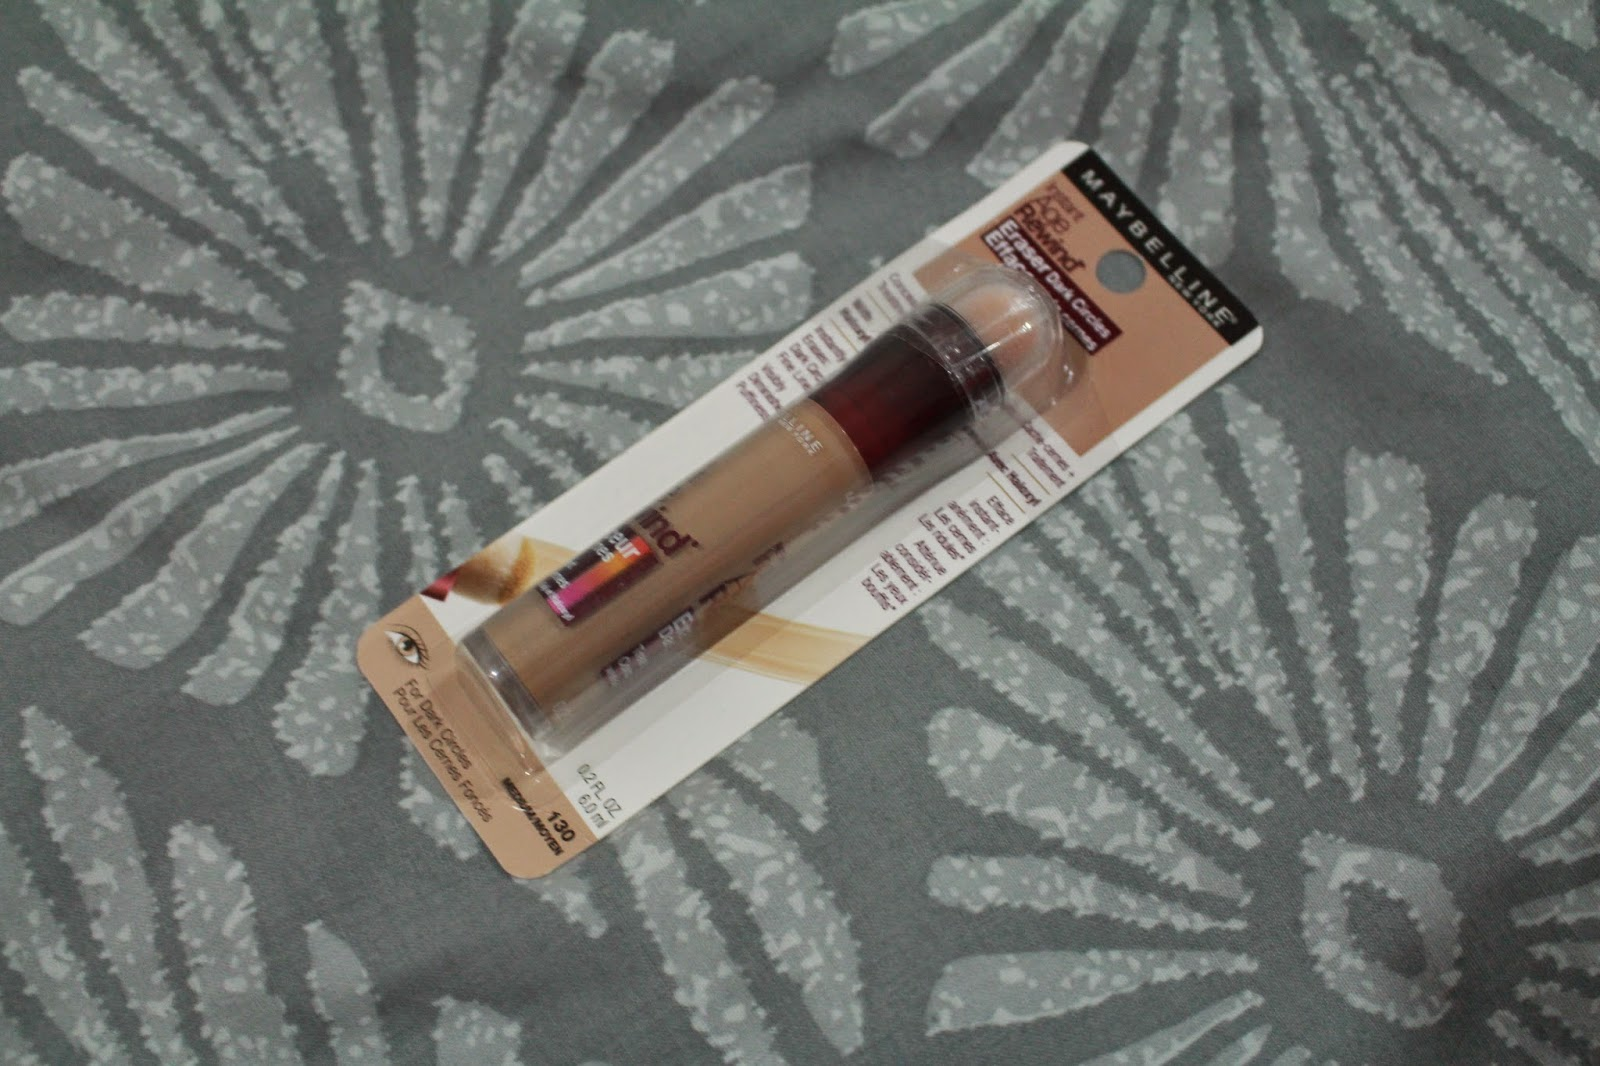 Maybelline Instant Age Rewind Concealer - Medium